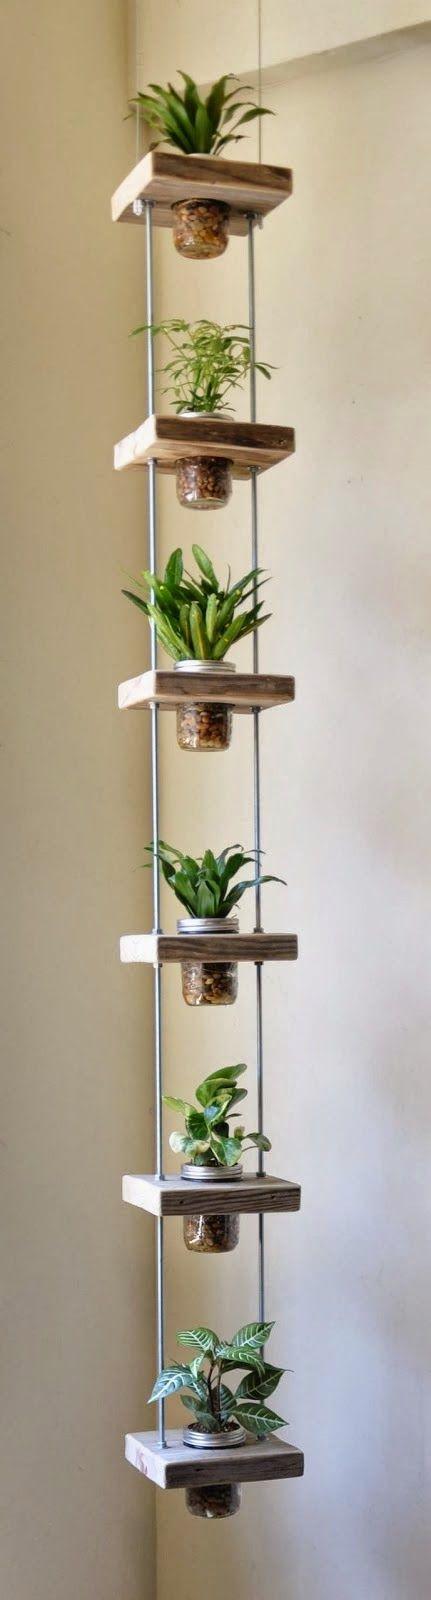 Inspiration Vertical Garden | Totaly Outdoors